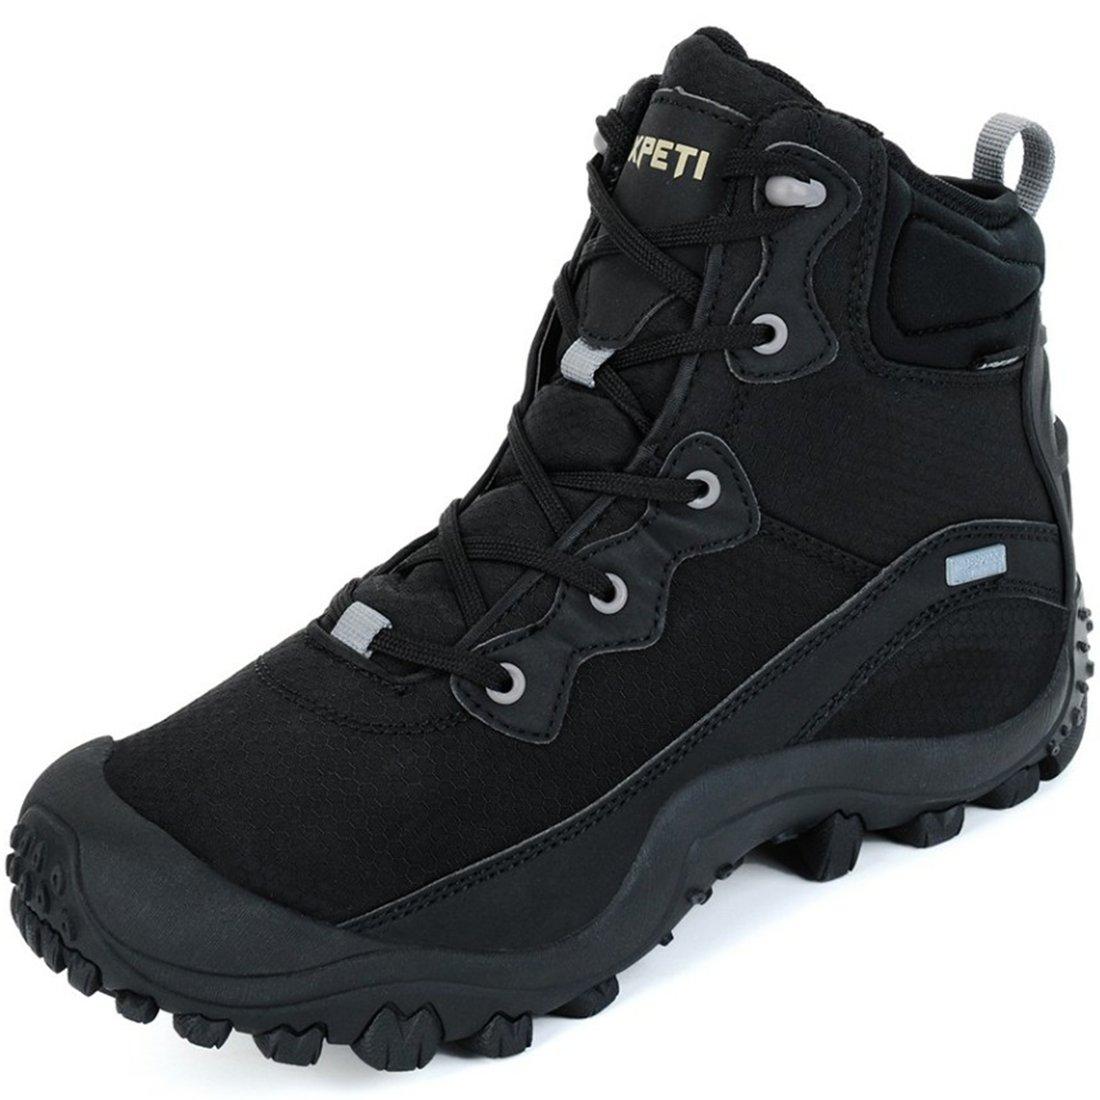 XPETI Women's Waterproof Mid Hiking Outdoor Boot (8 B(M) US, Black)